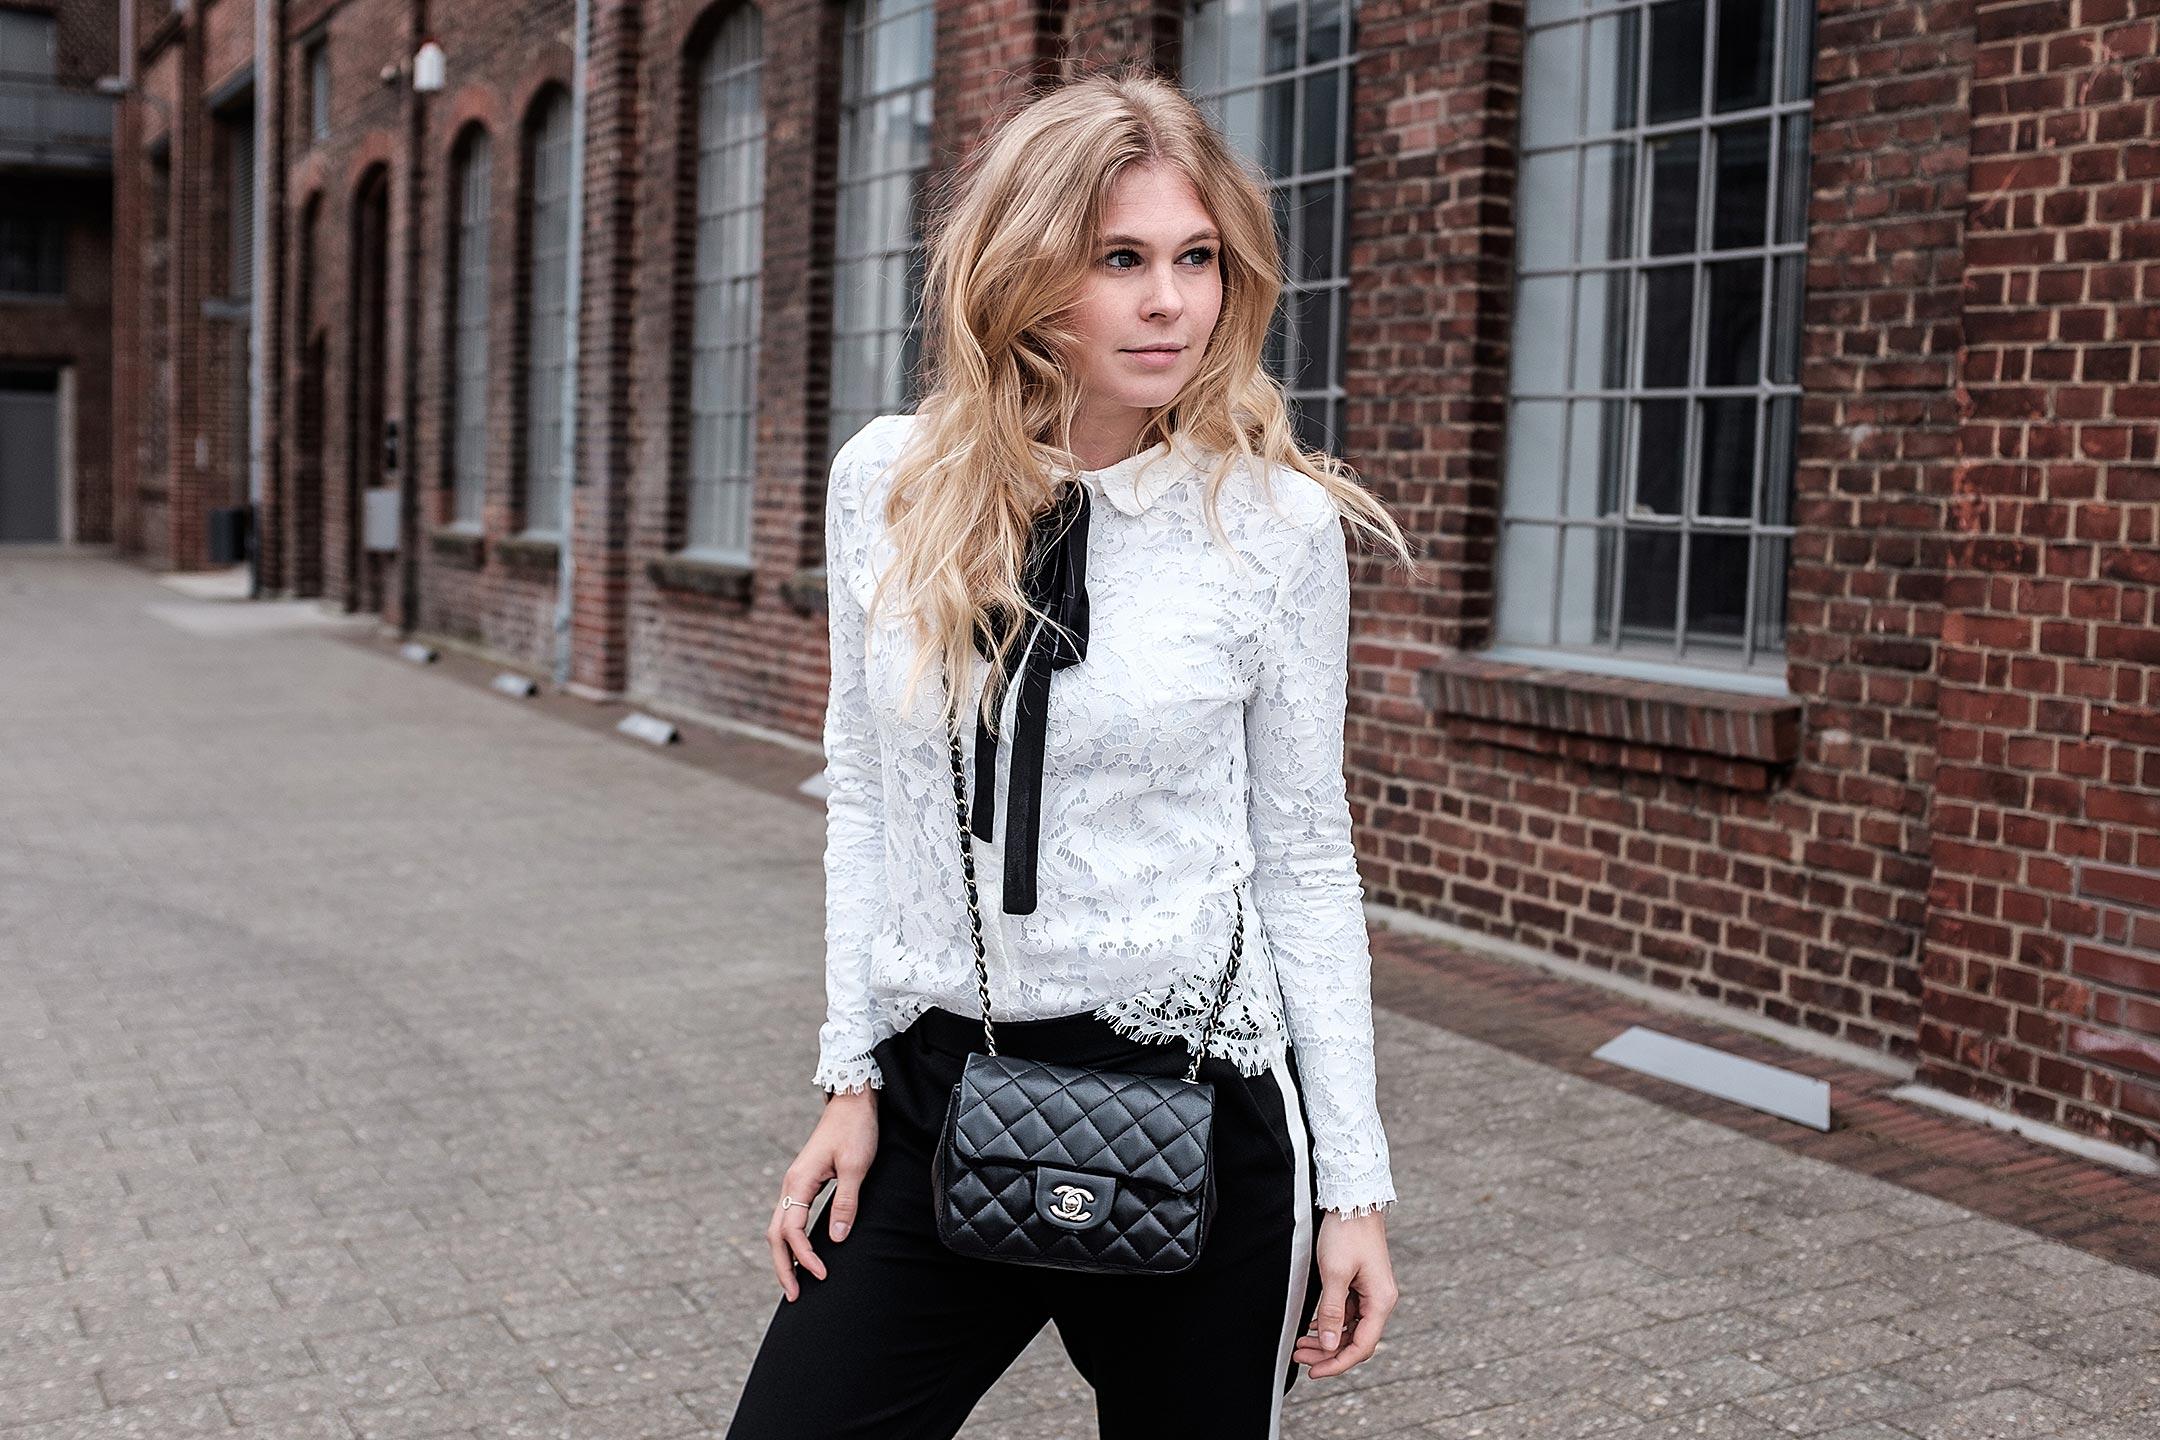 Sunnyinga schwarz weiß Outfit Fashionblog Düsseldorf